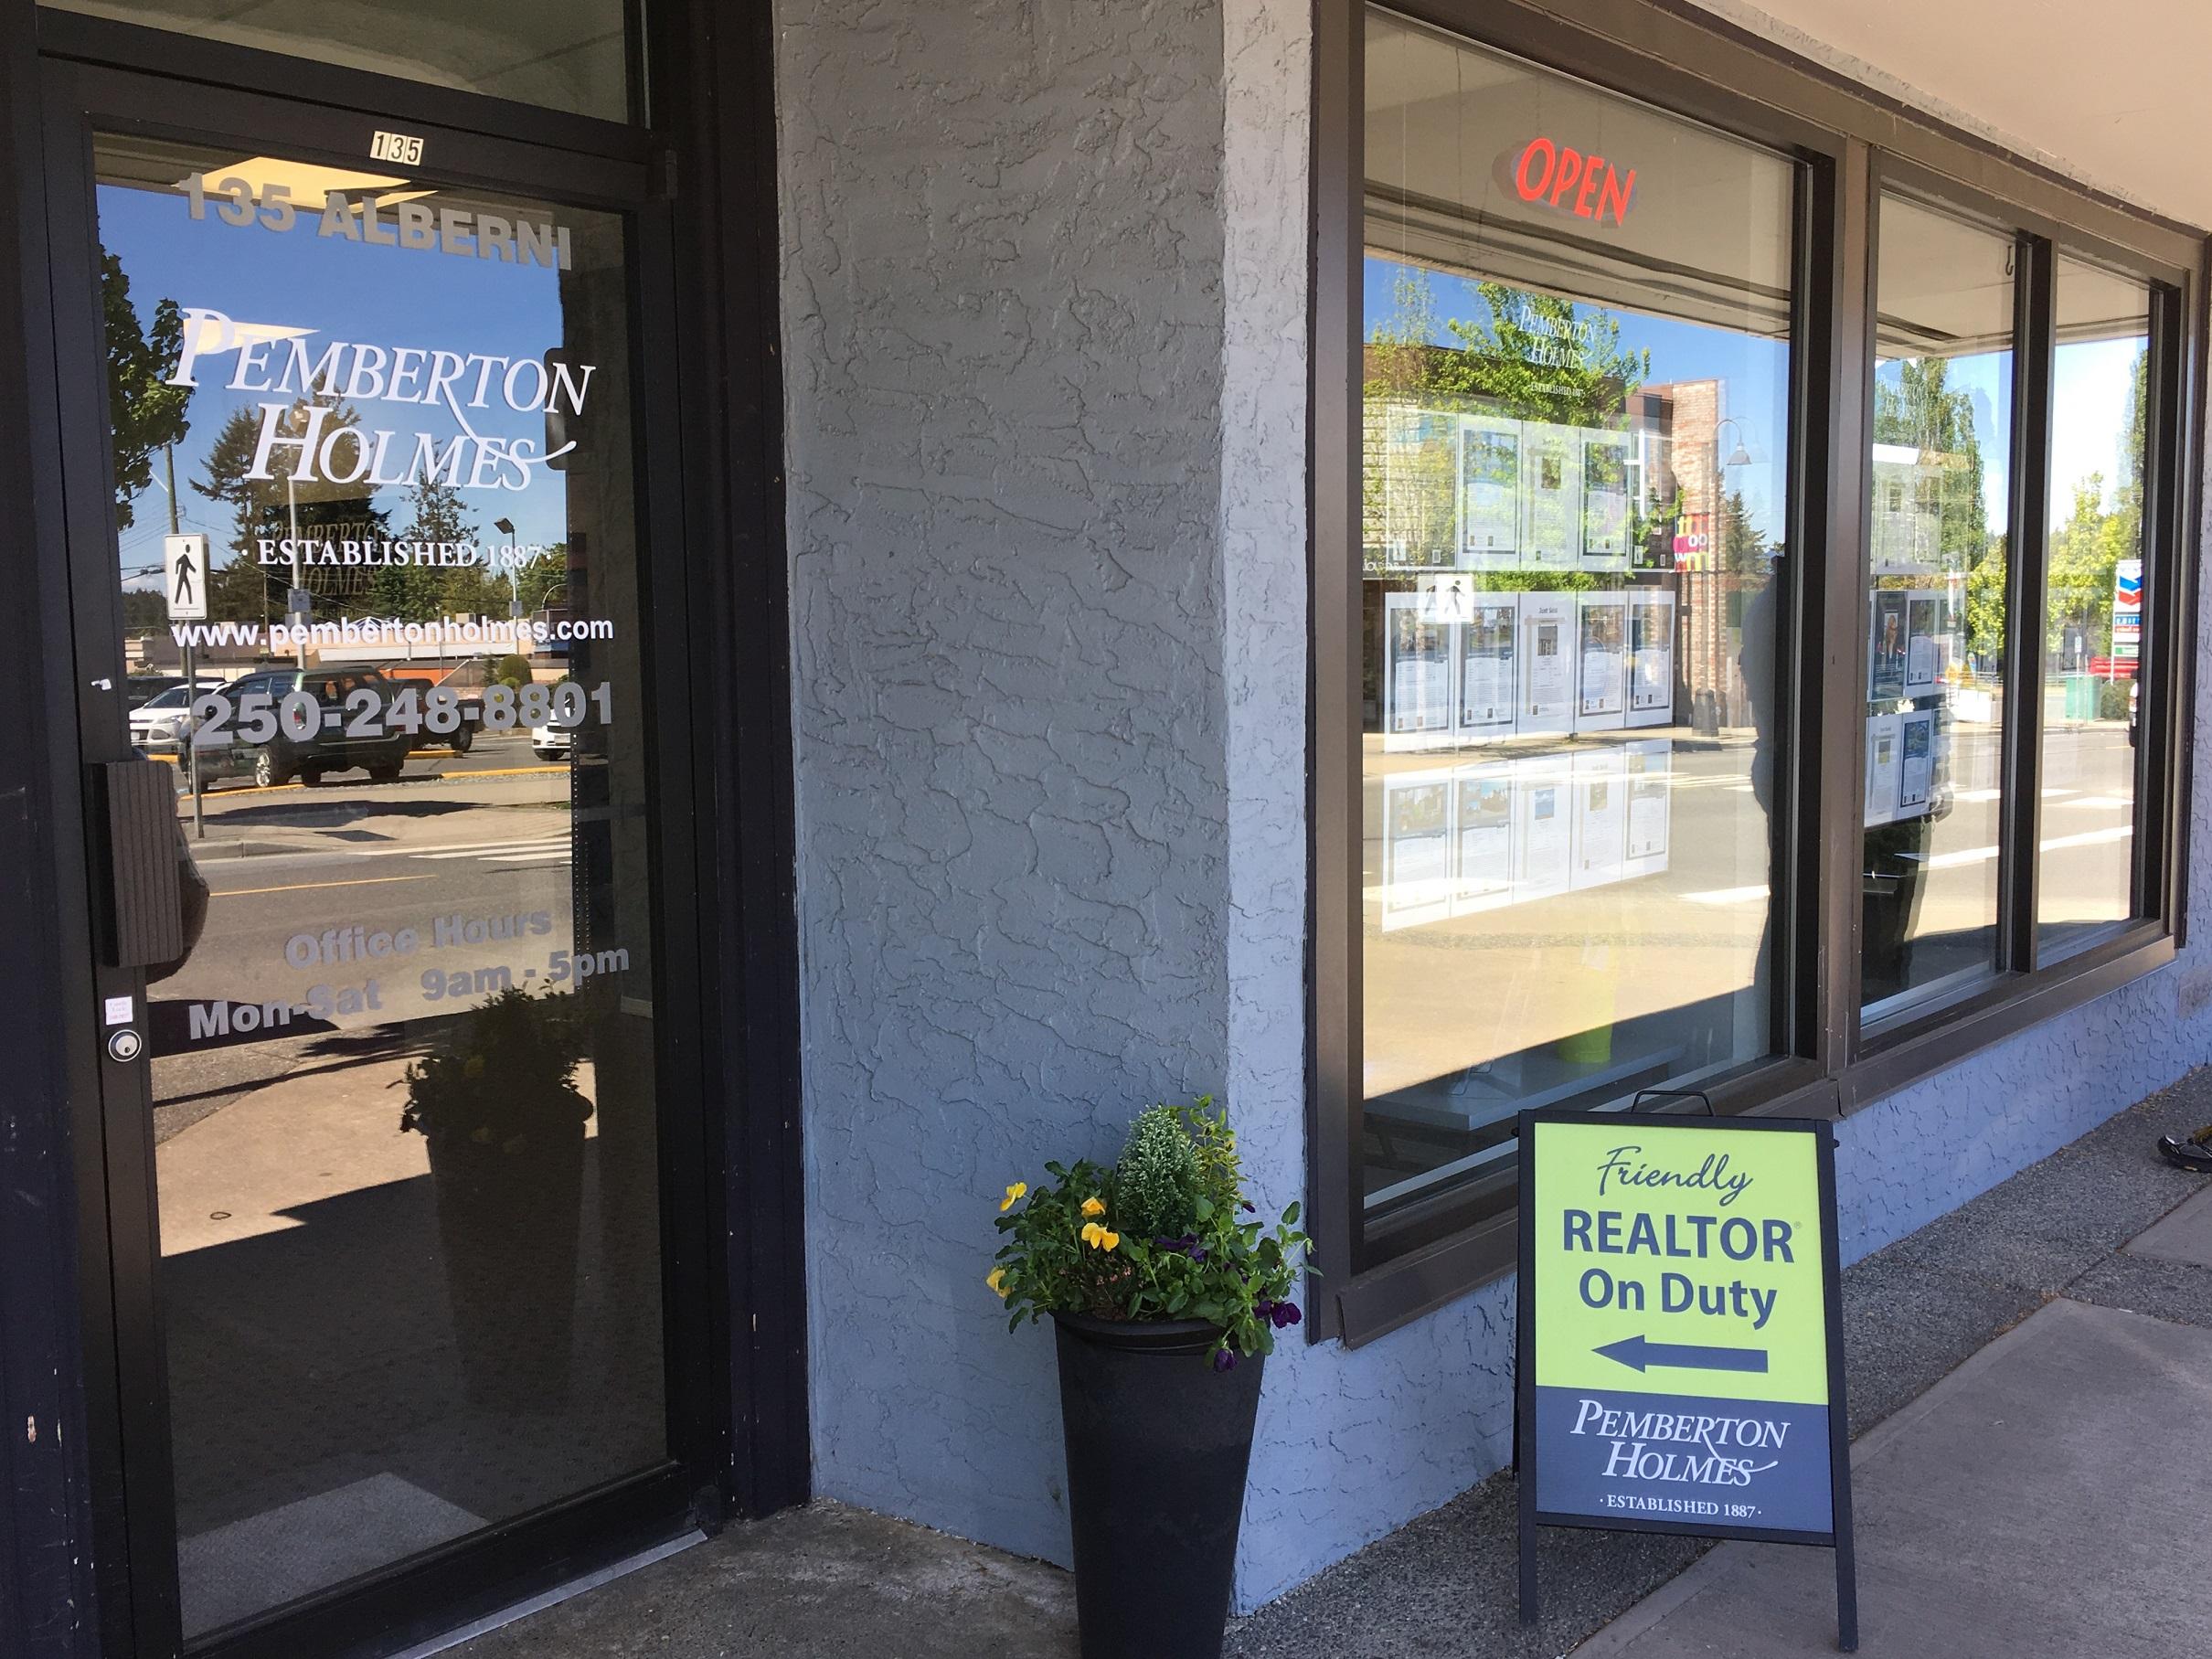 Pemberton Holmes Parksville Qualicum BC office contact information